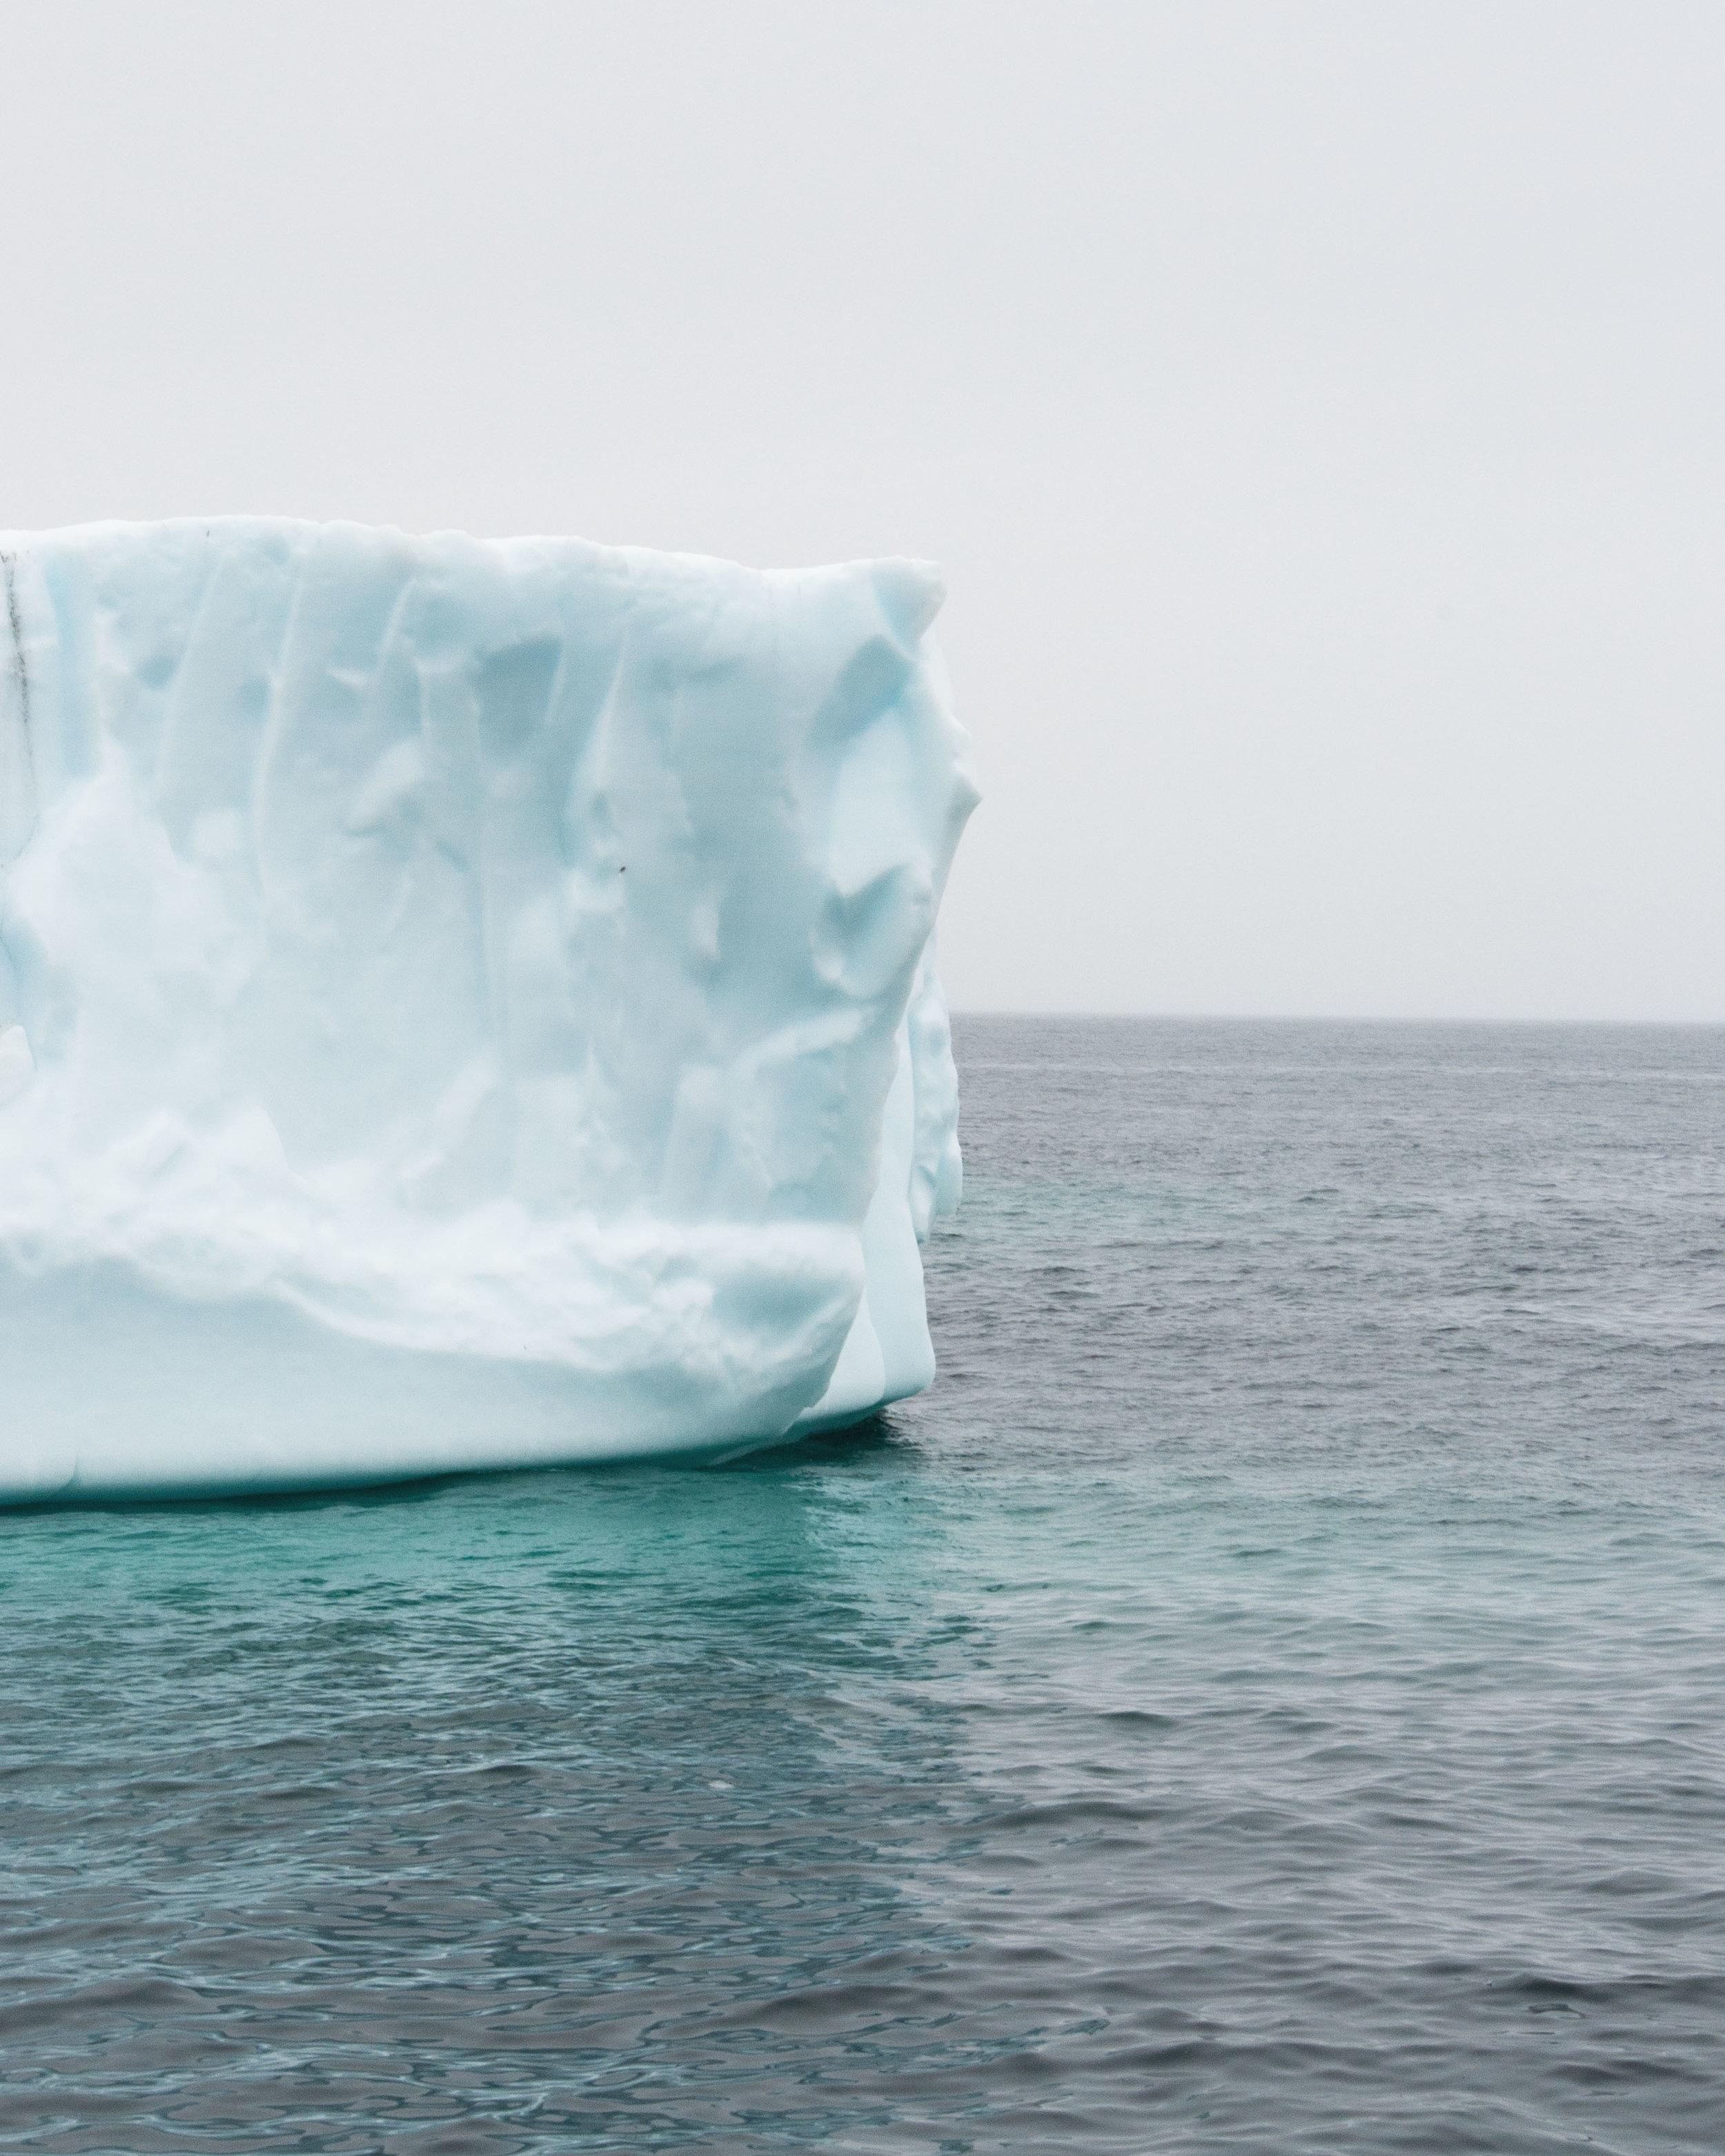 Newfoundland-photo-essay-rucksack-magazine